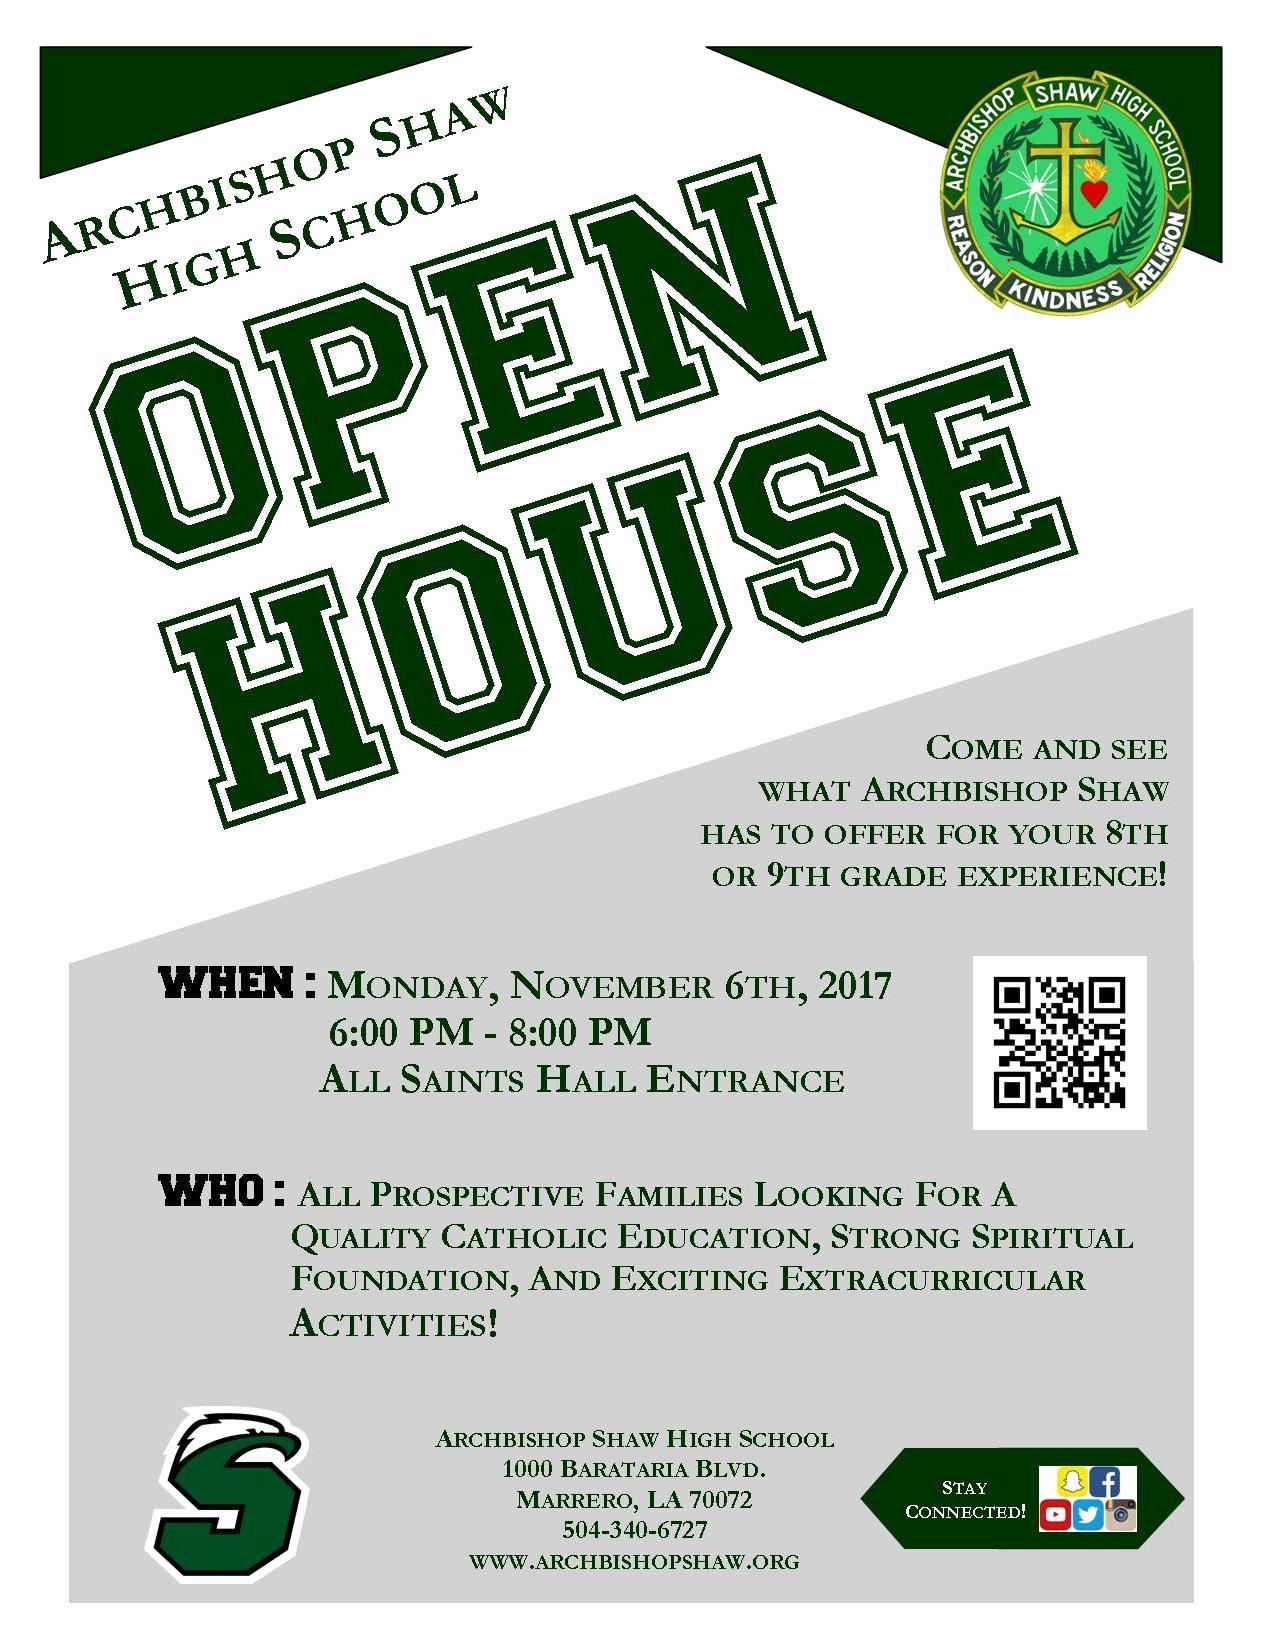 Open House Flyer for School Beautiful Open House Archbishop Shaw High School